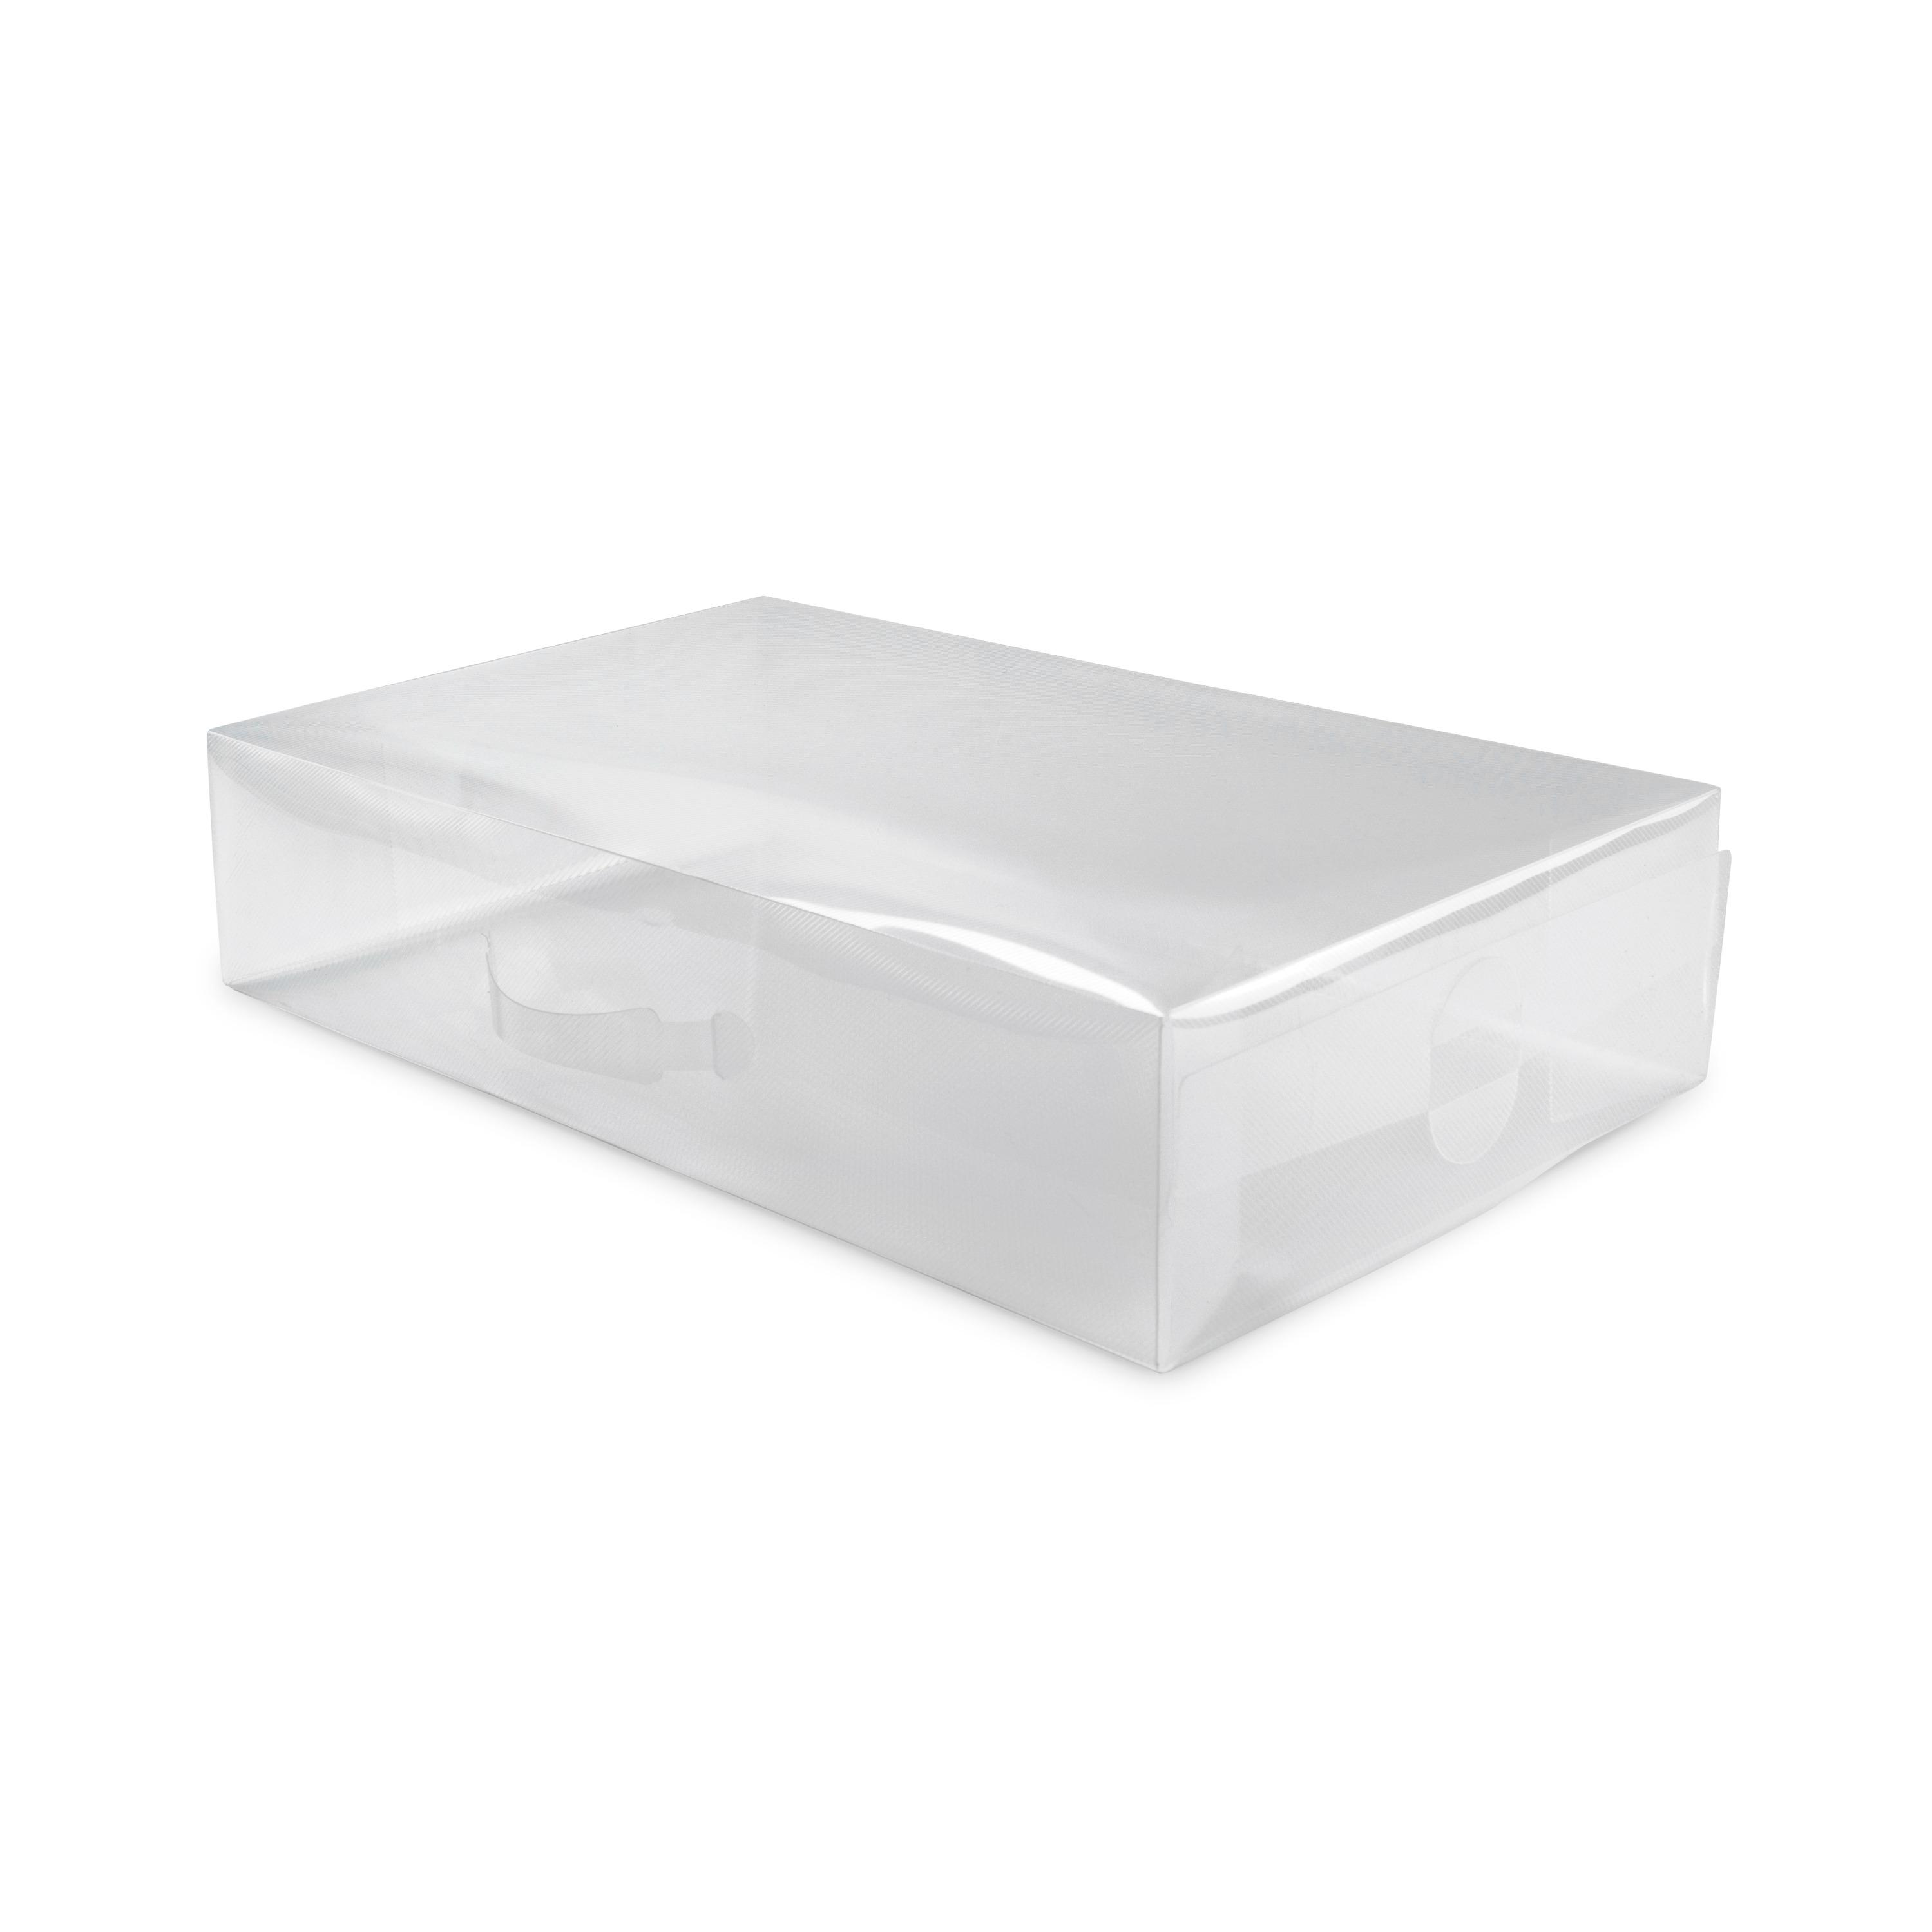 Boîte chaussures transparente 52x30cm